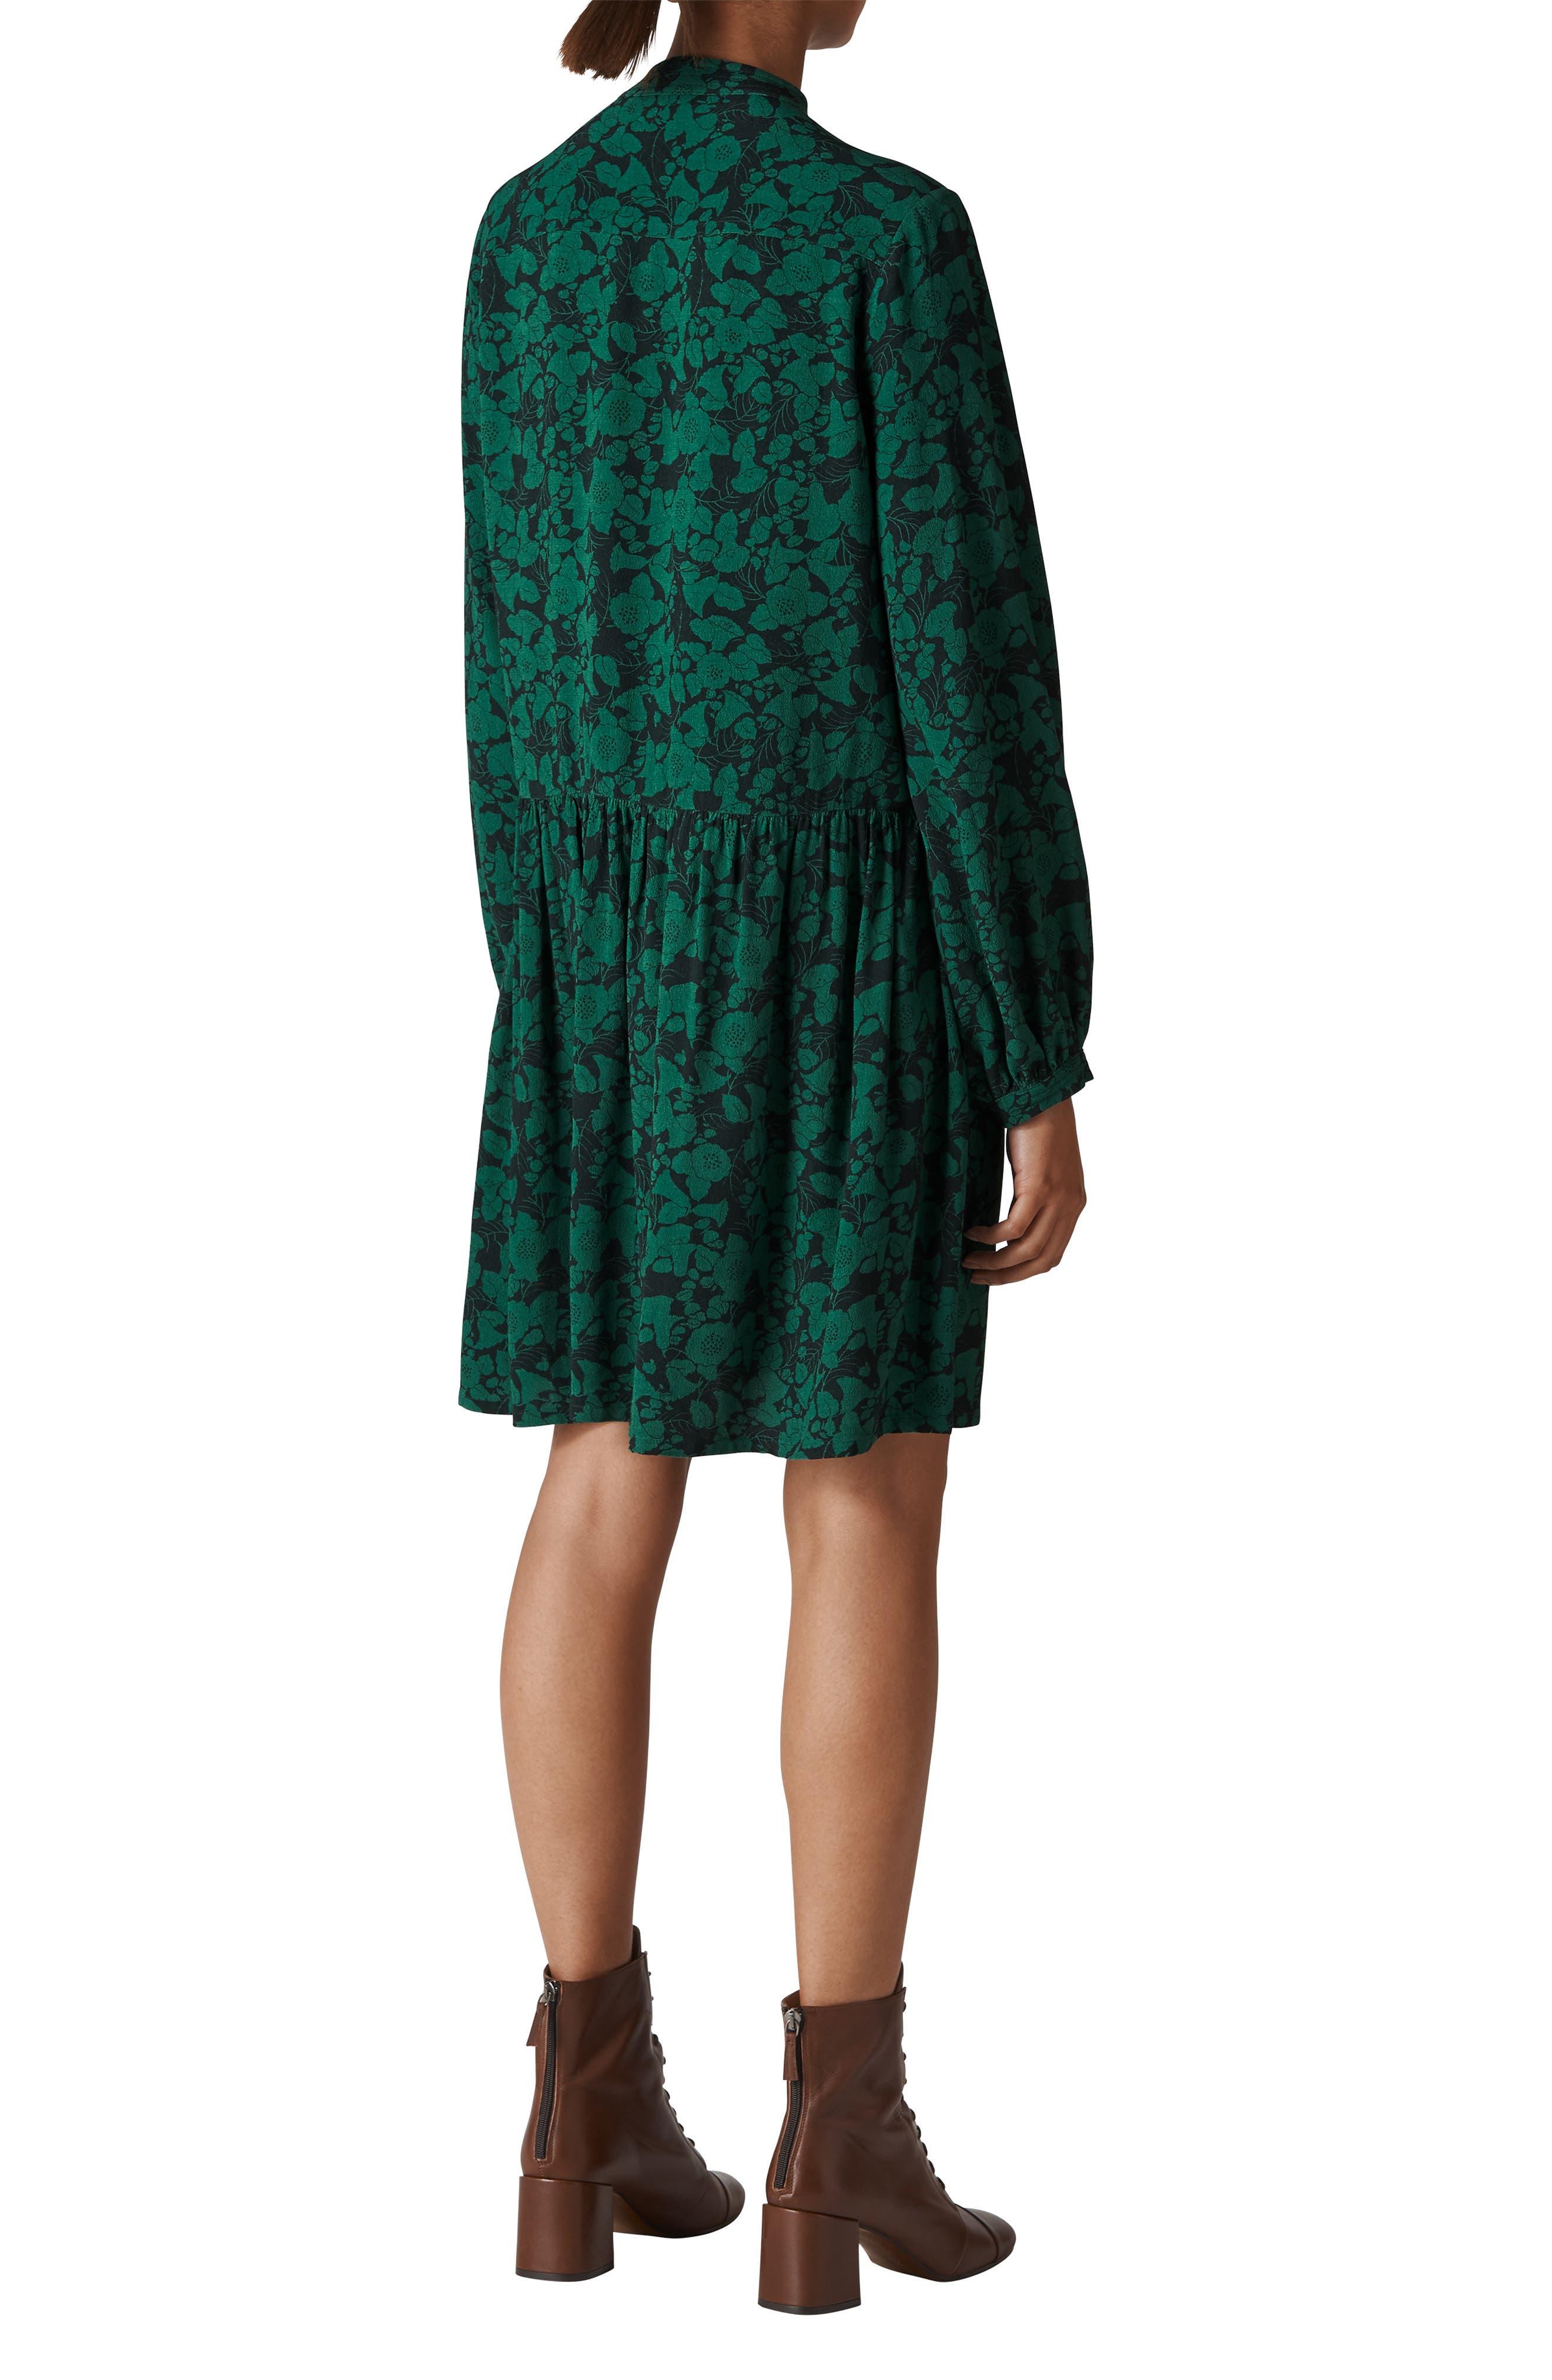 Deco Floral Print Shirtdress,                             Alternate thumbnail 2, color,                             GREEN/ MULTI